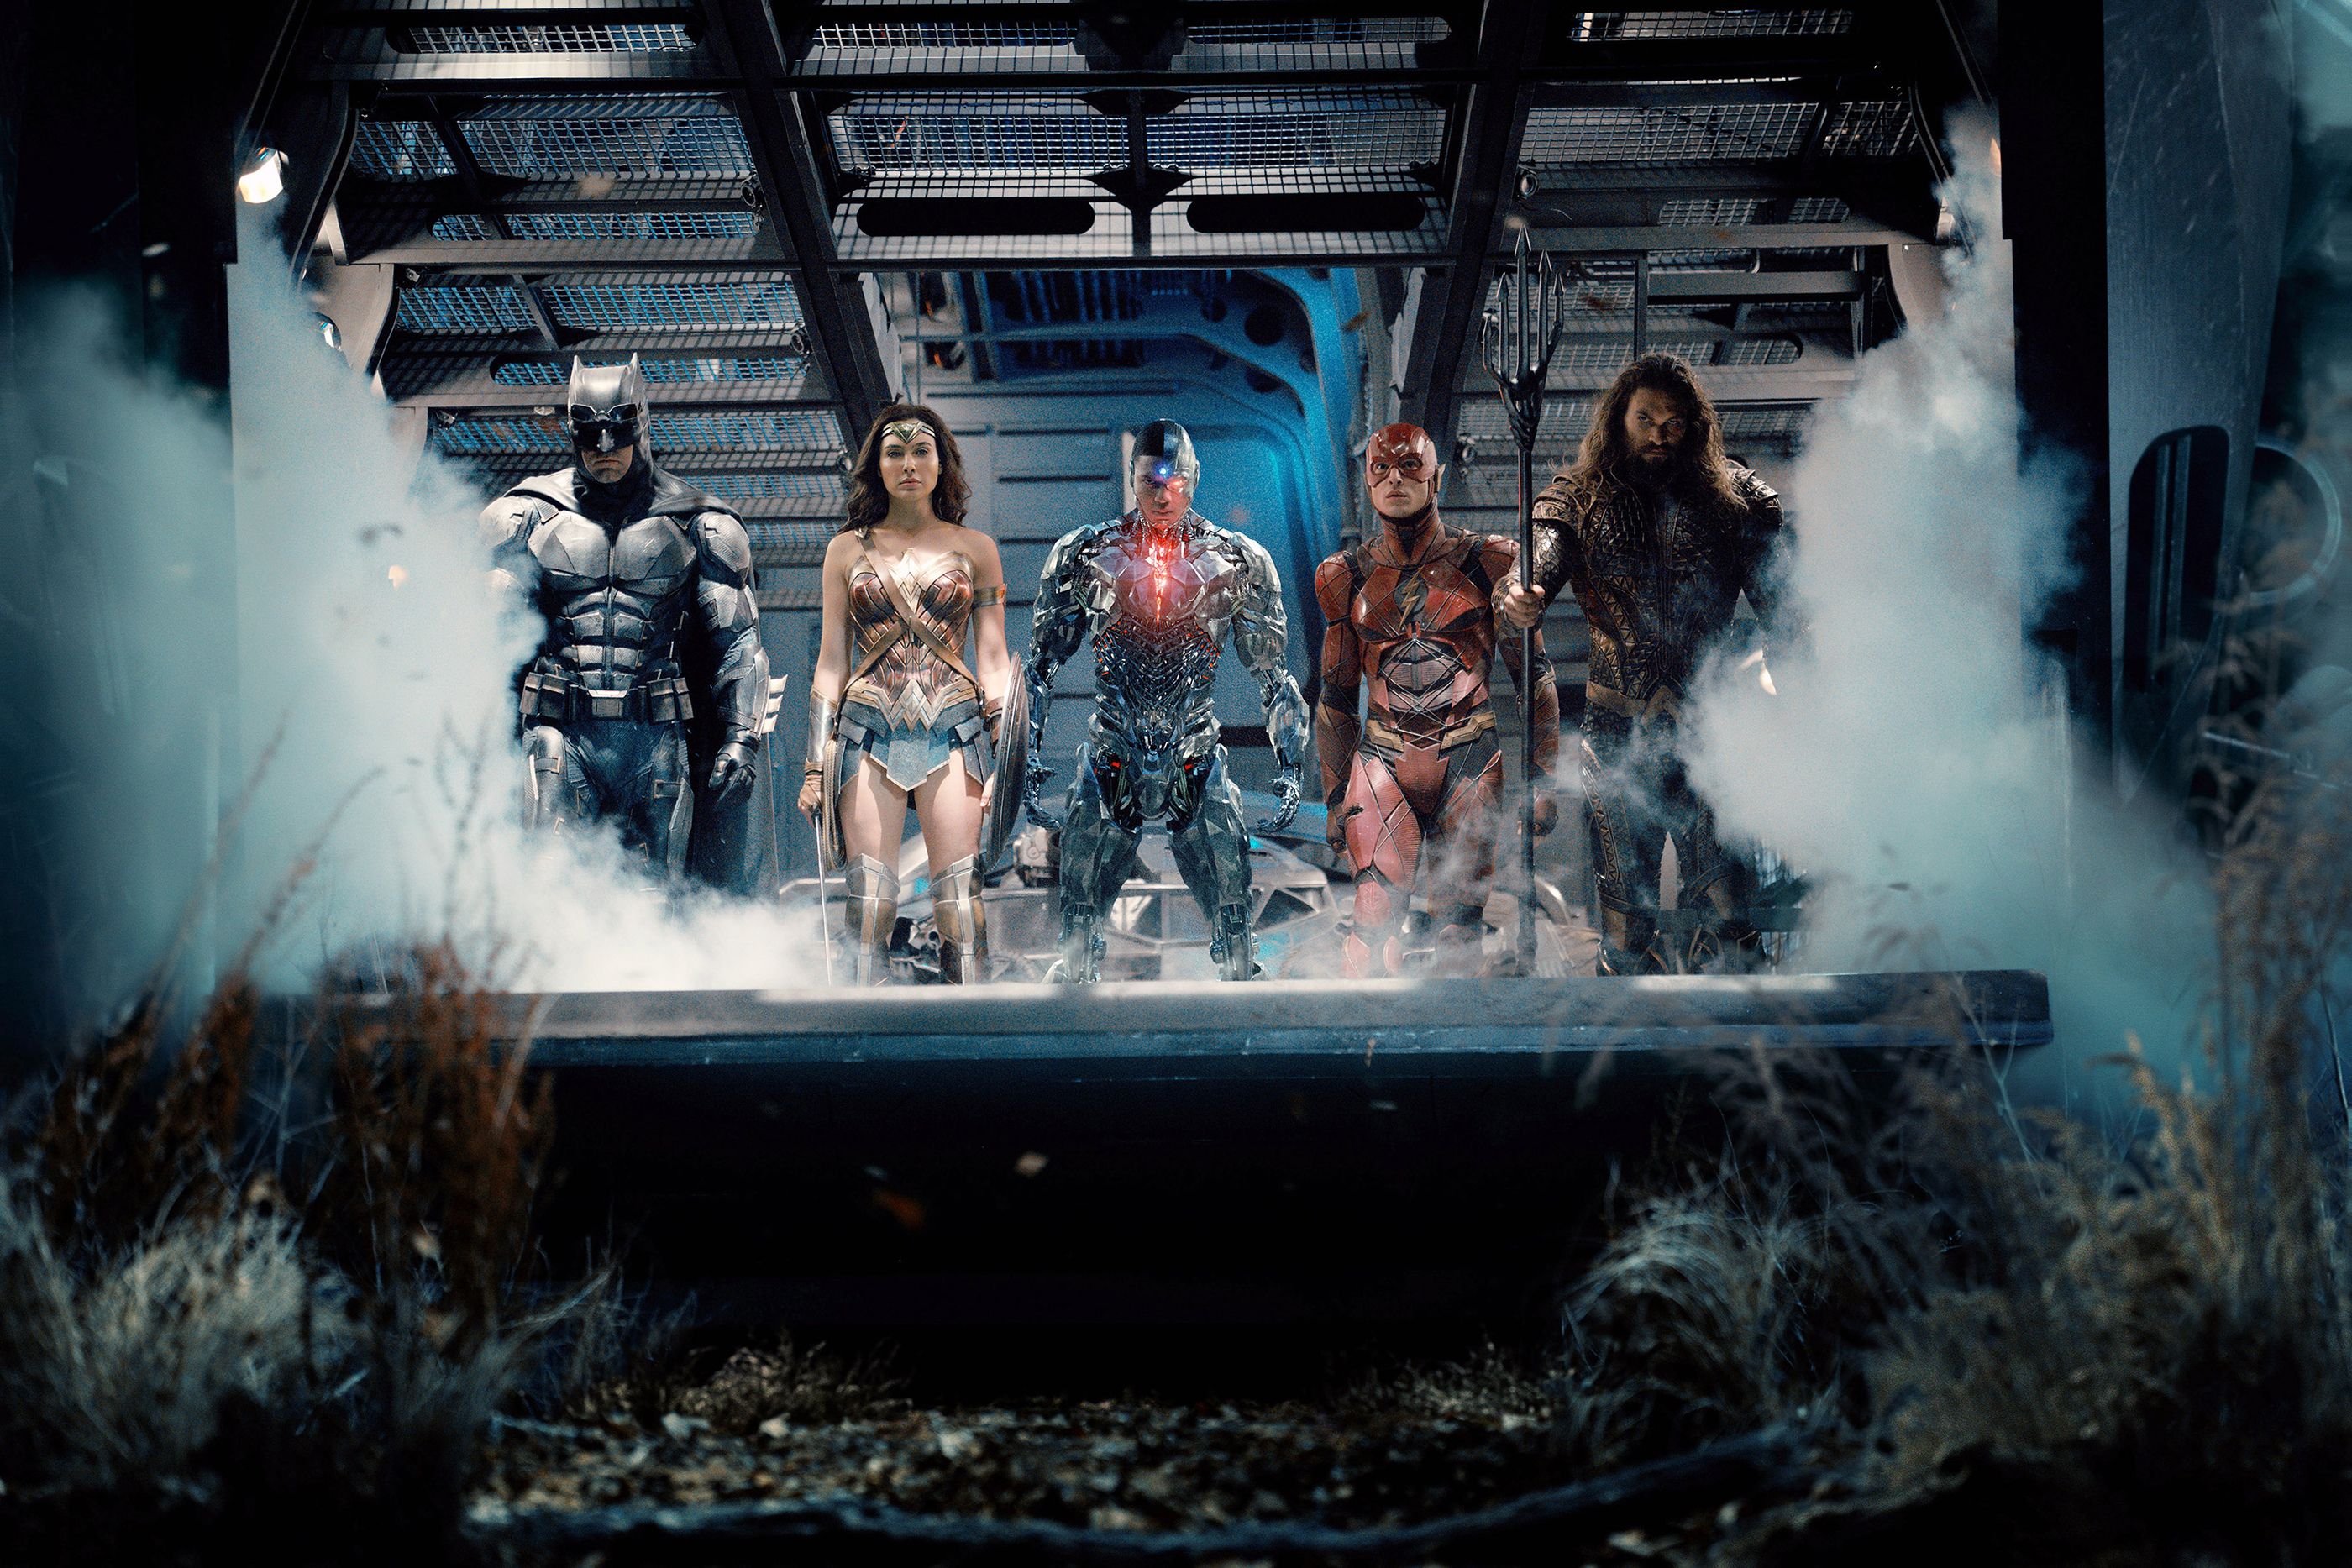 JUSTICE LEAGUE, from left: Ben Affleck as Batman, Gal Gadot as Wonder Woman, Ray Fisher as Cyborg, Ezra Miller as The Flash, Jason Momoa as Aquaman, 2017.